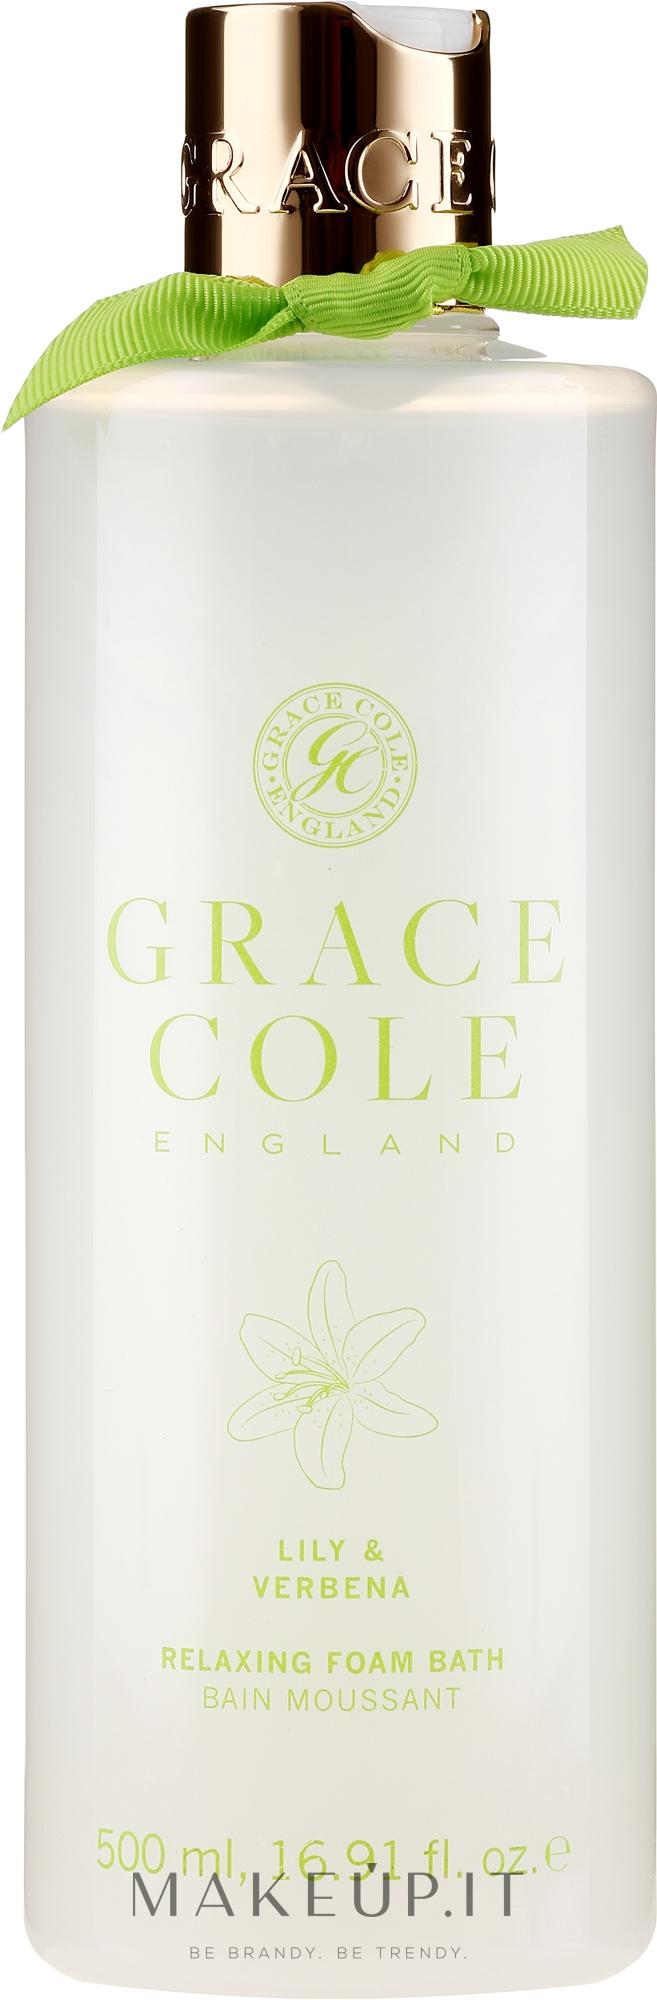 "Bagnoschiuma ""Giglio e Verbena"" - Grace Cole Lily & Verbena Foam Bath — foto 500 ml"